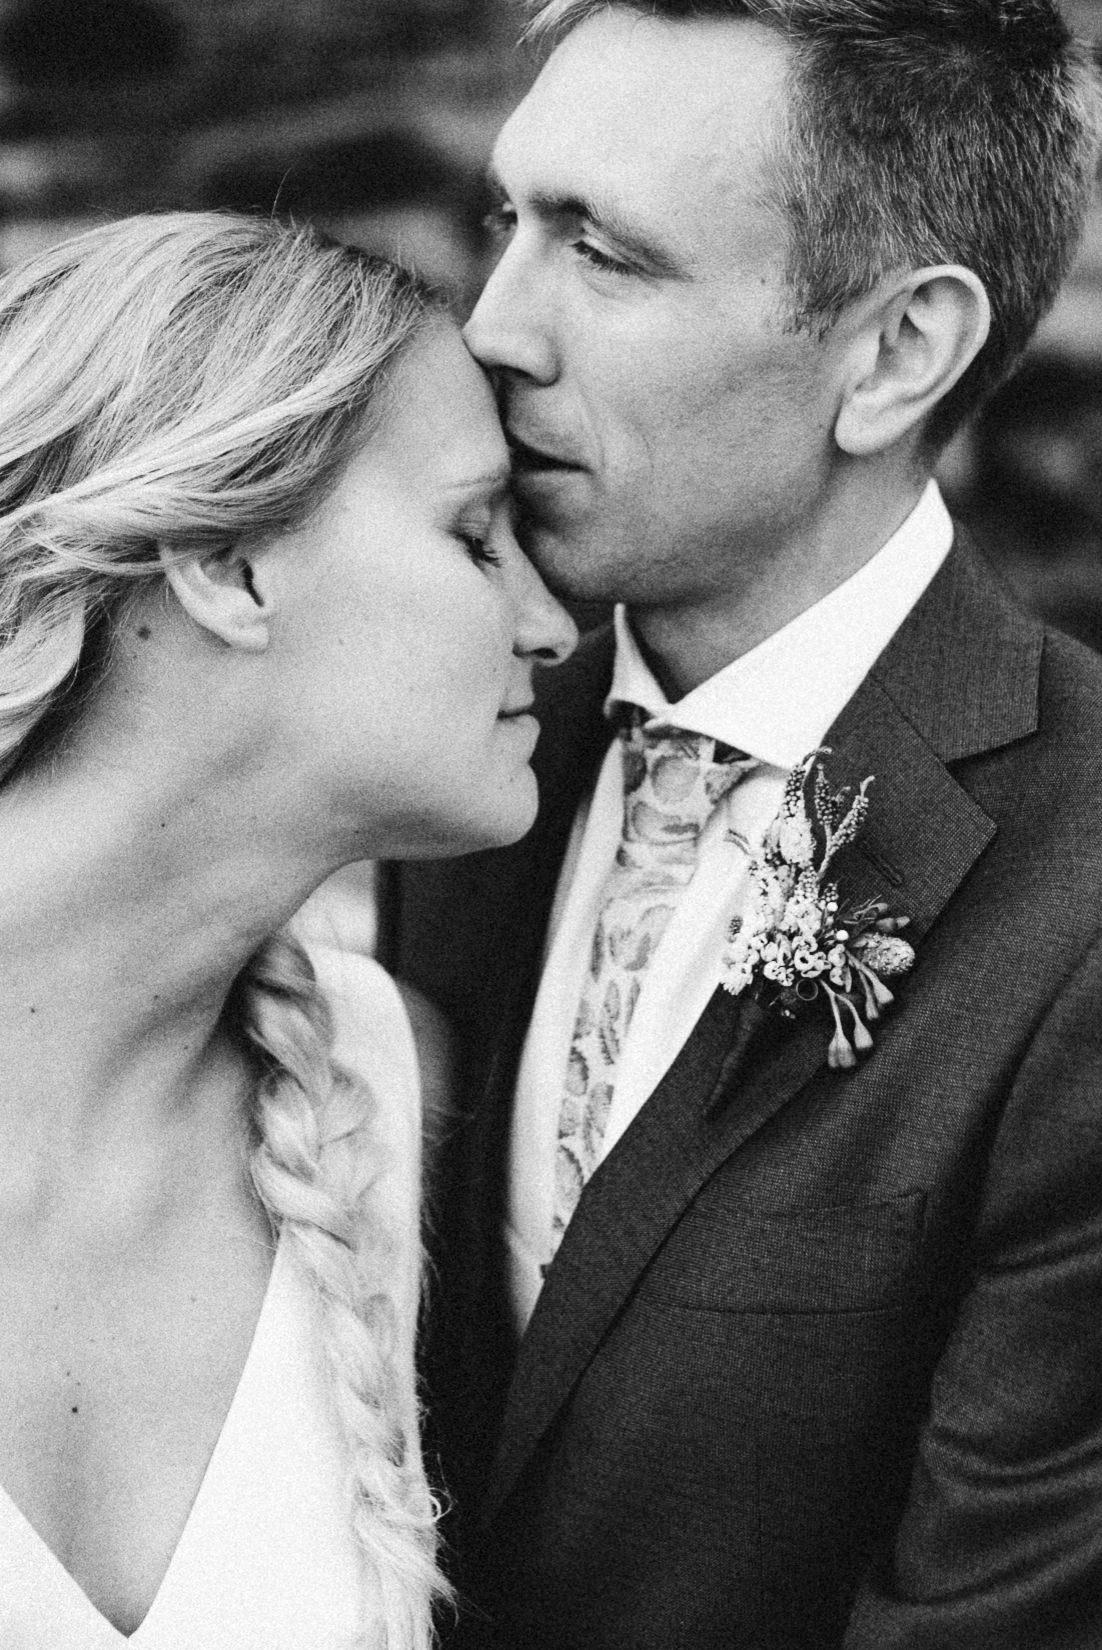 Sydney Wedding Photographer (150 of 182).jpg